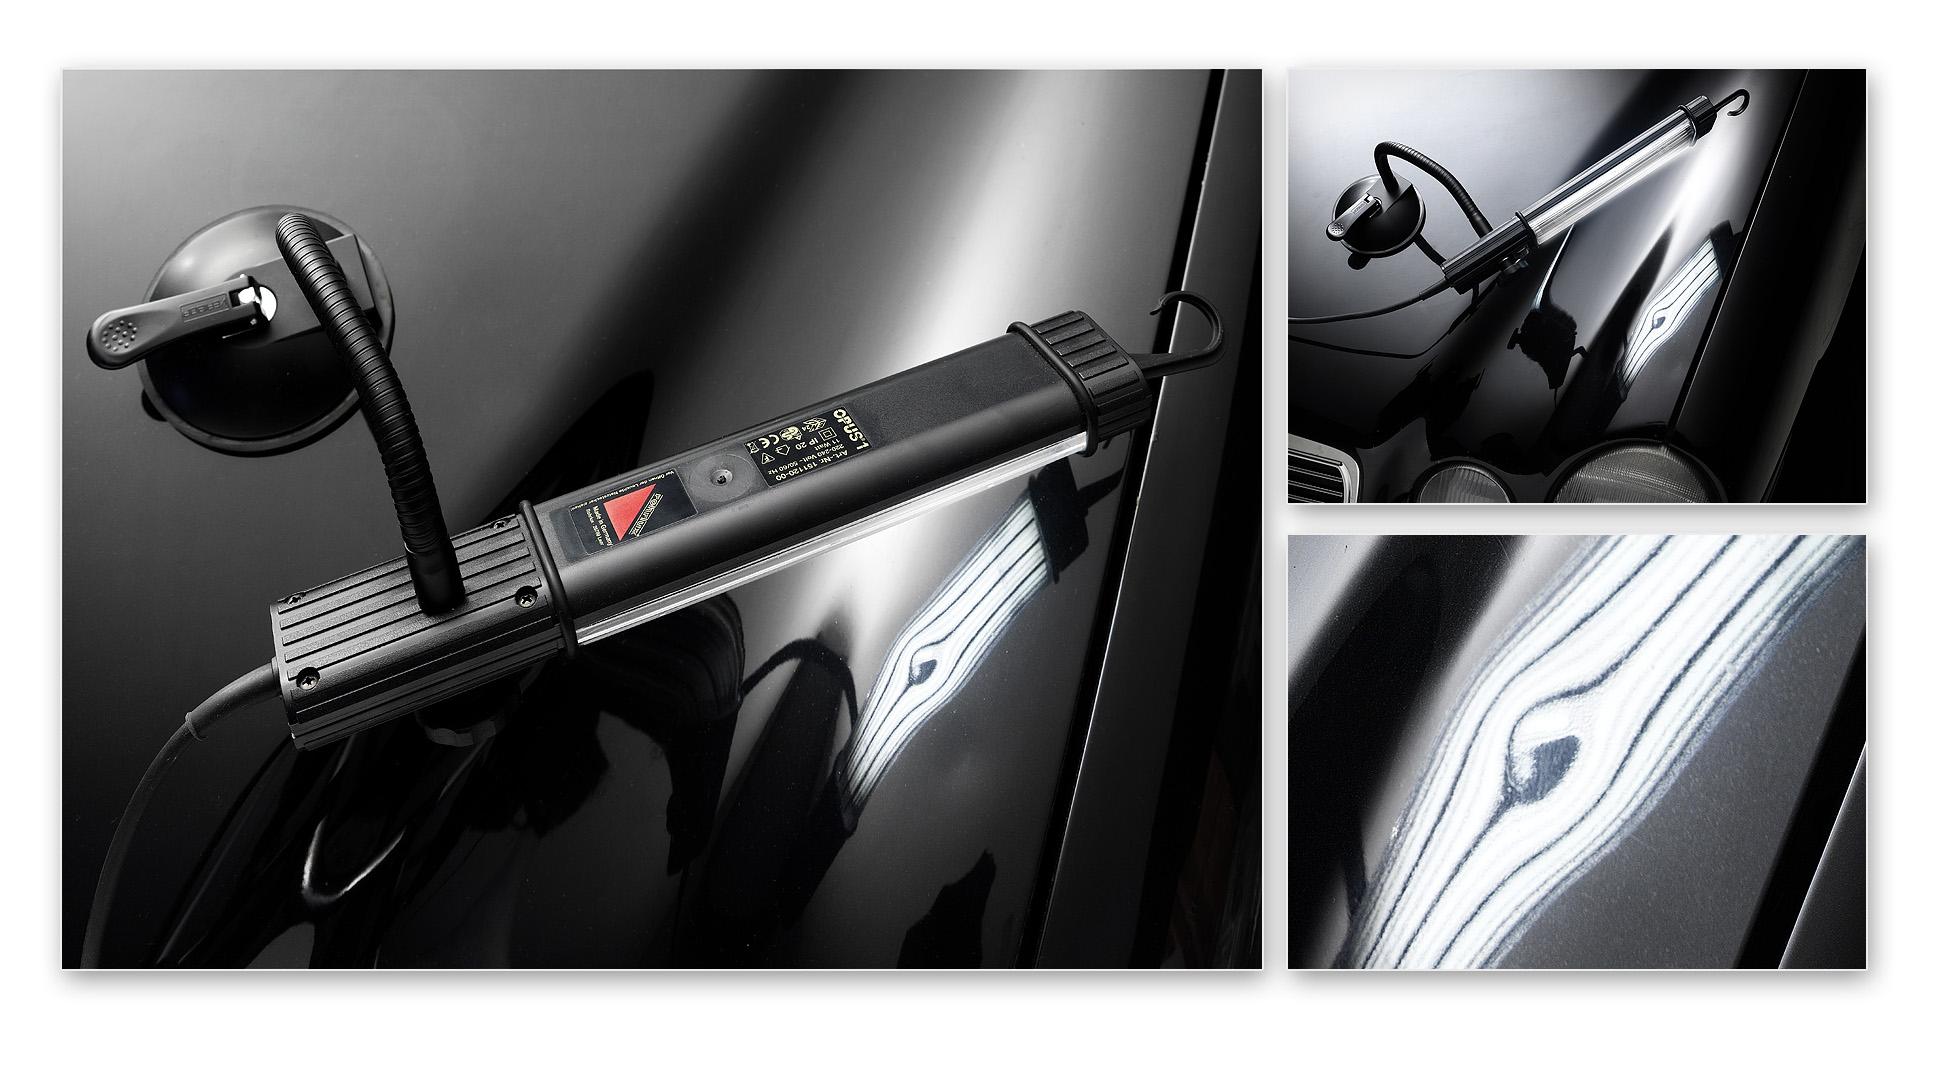 Opus-I-LED 12 Watt 220-240 Volt AC warm/kaltweiß